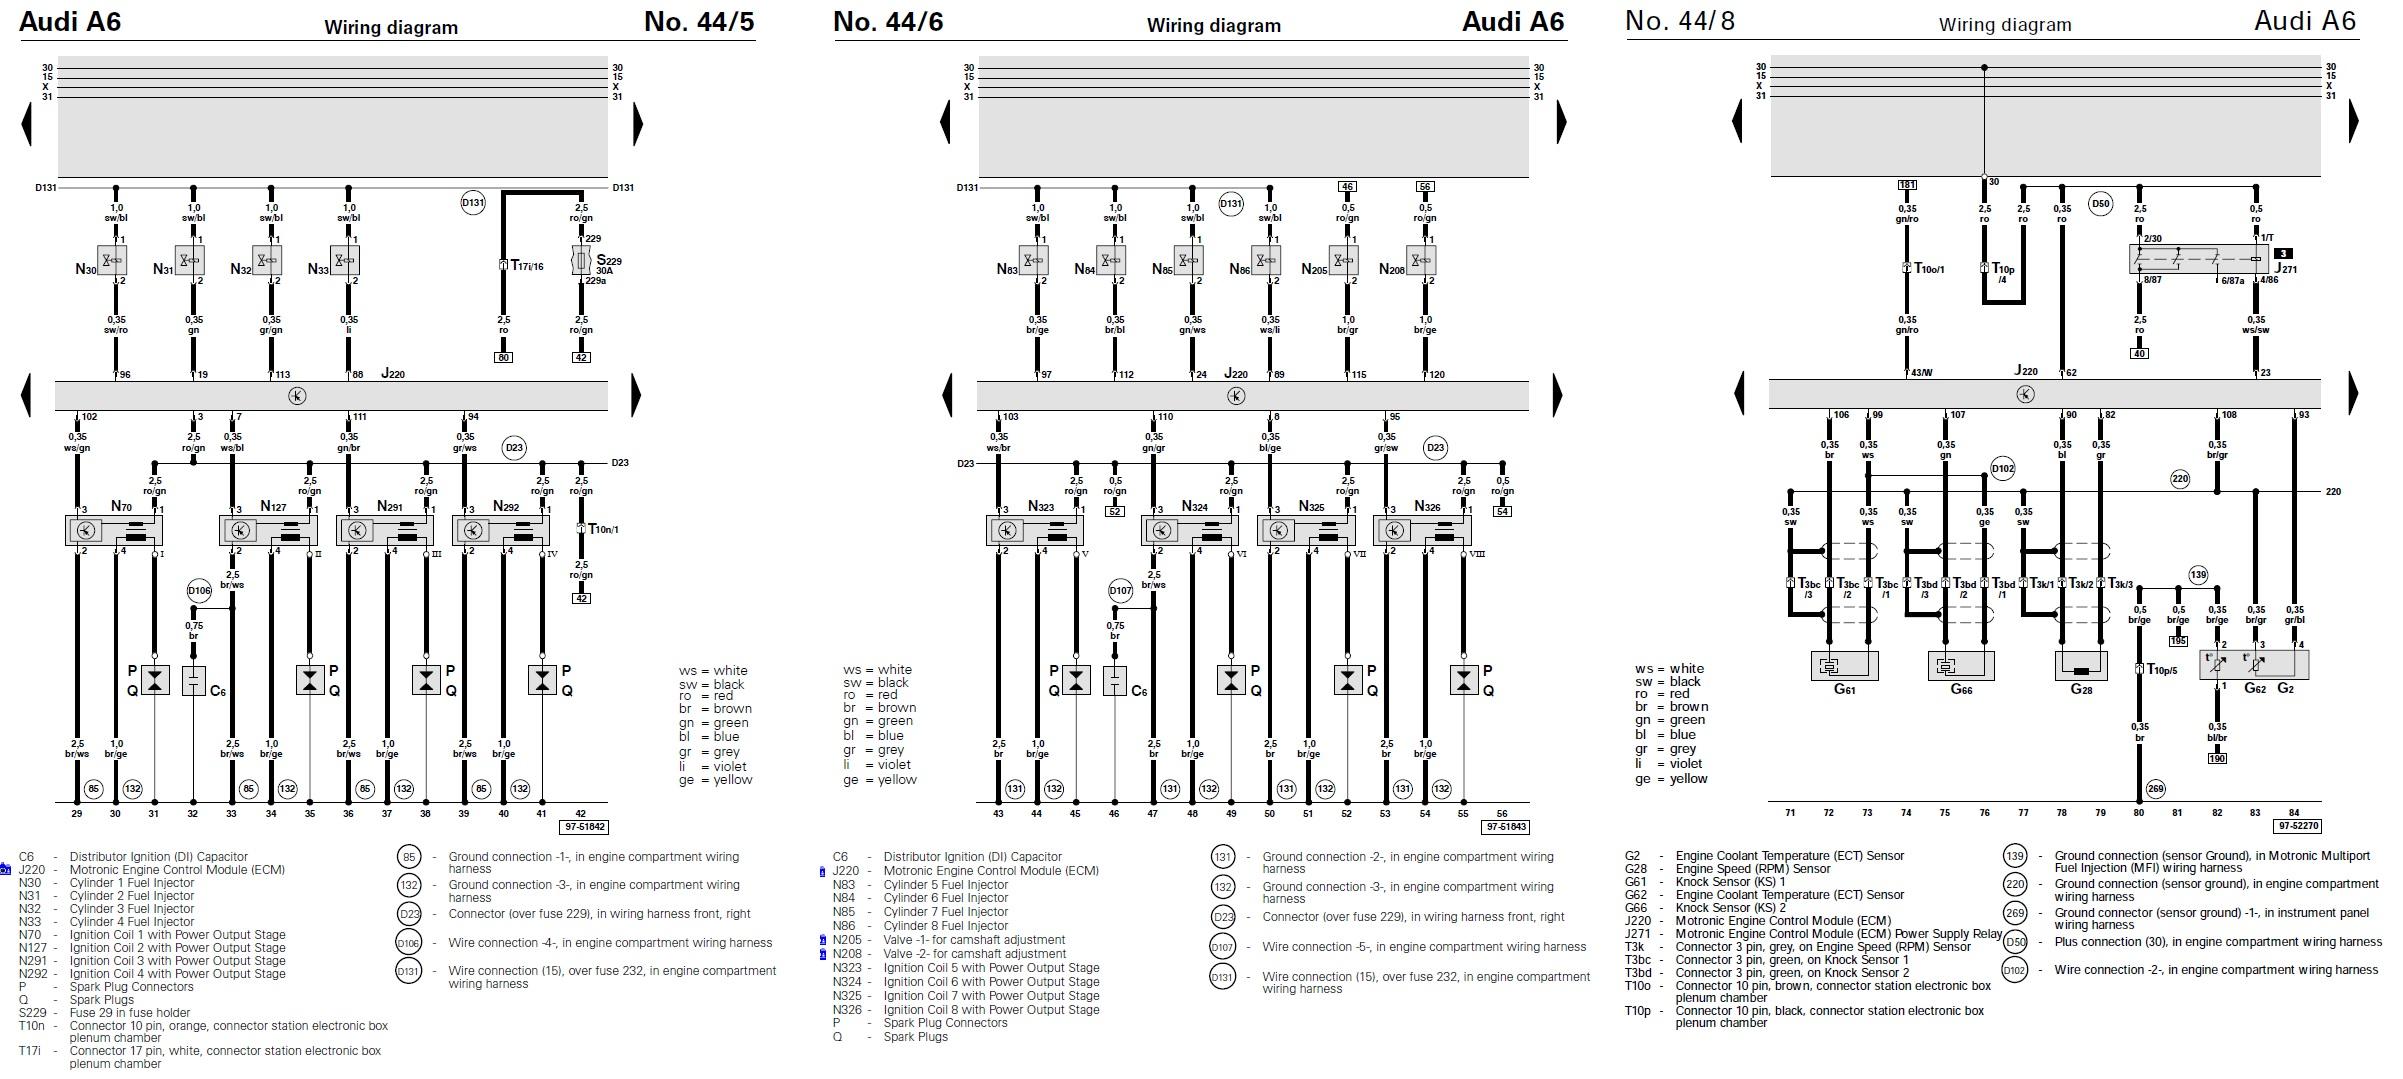 Quattroworld Forums From A6 Repair Manual 4 2 J271